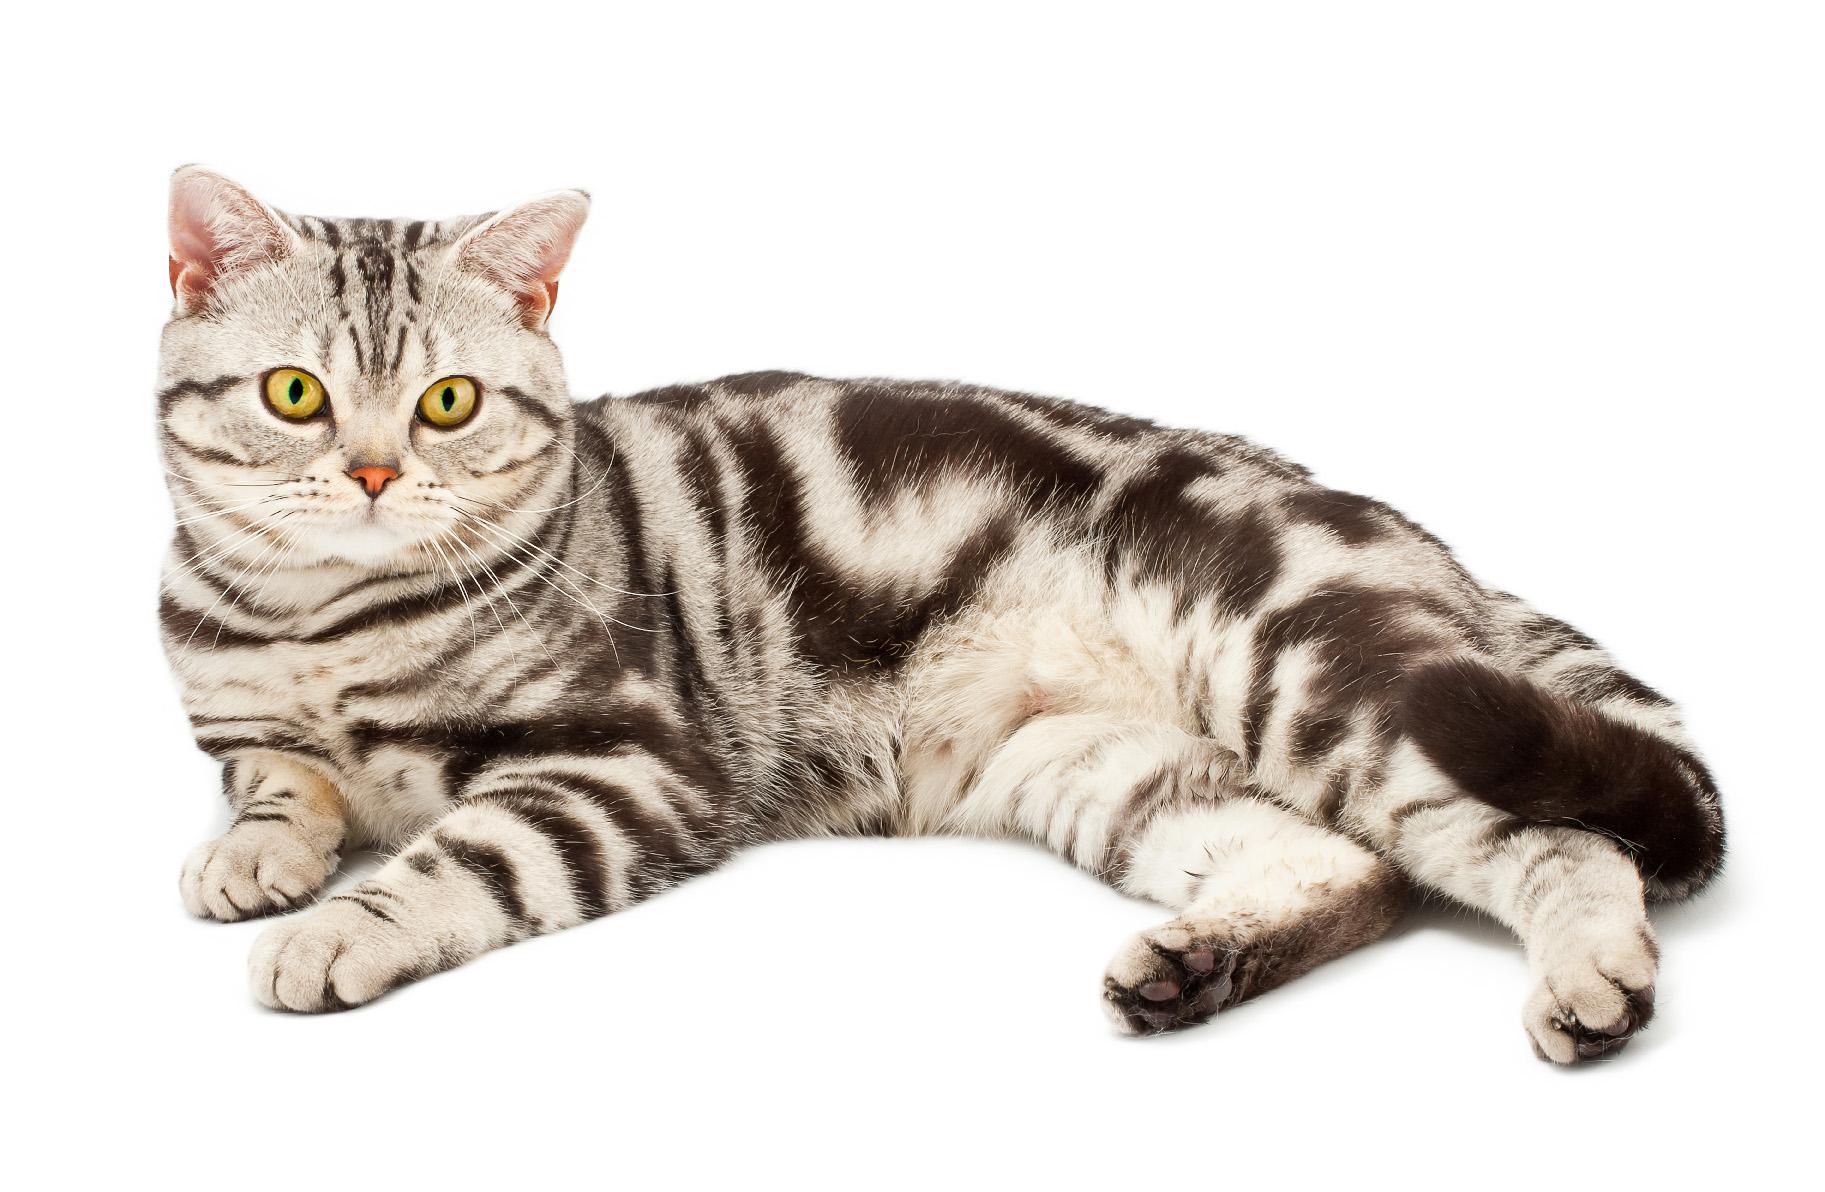 amerikai rövidszőrű macska